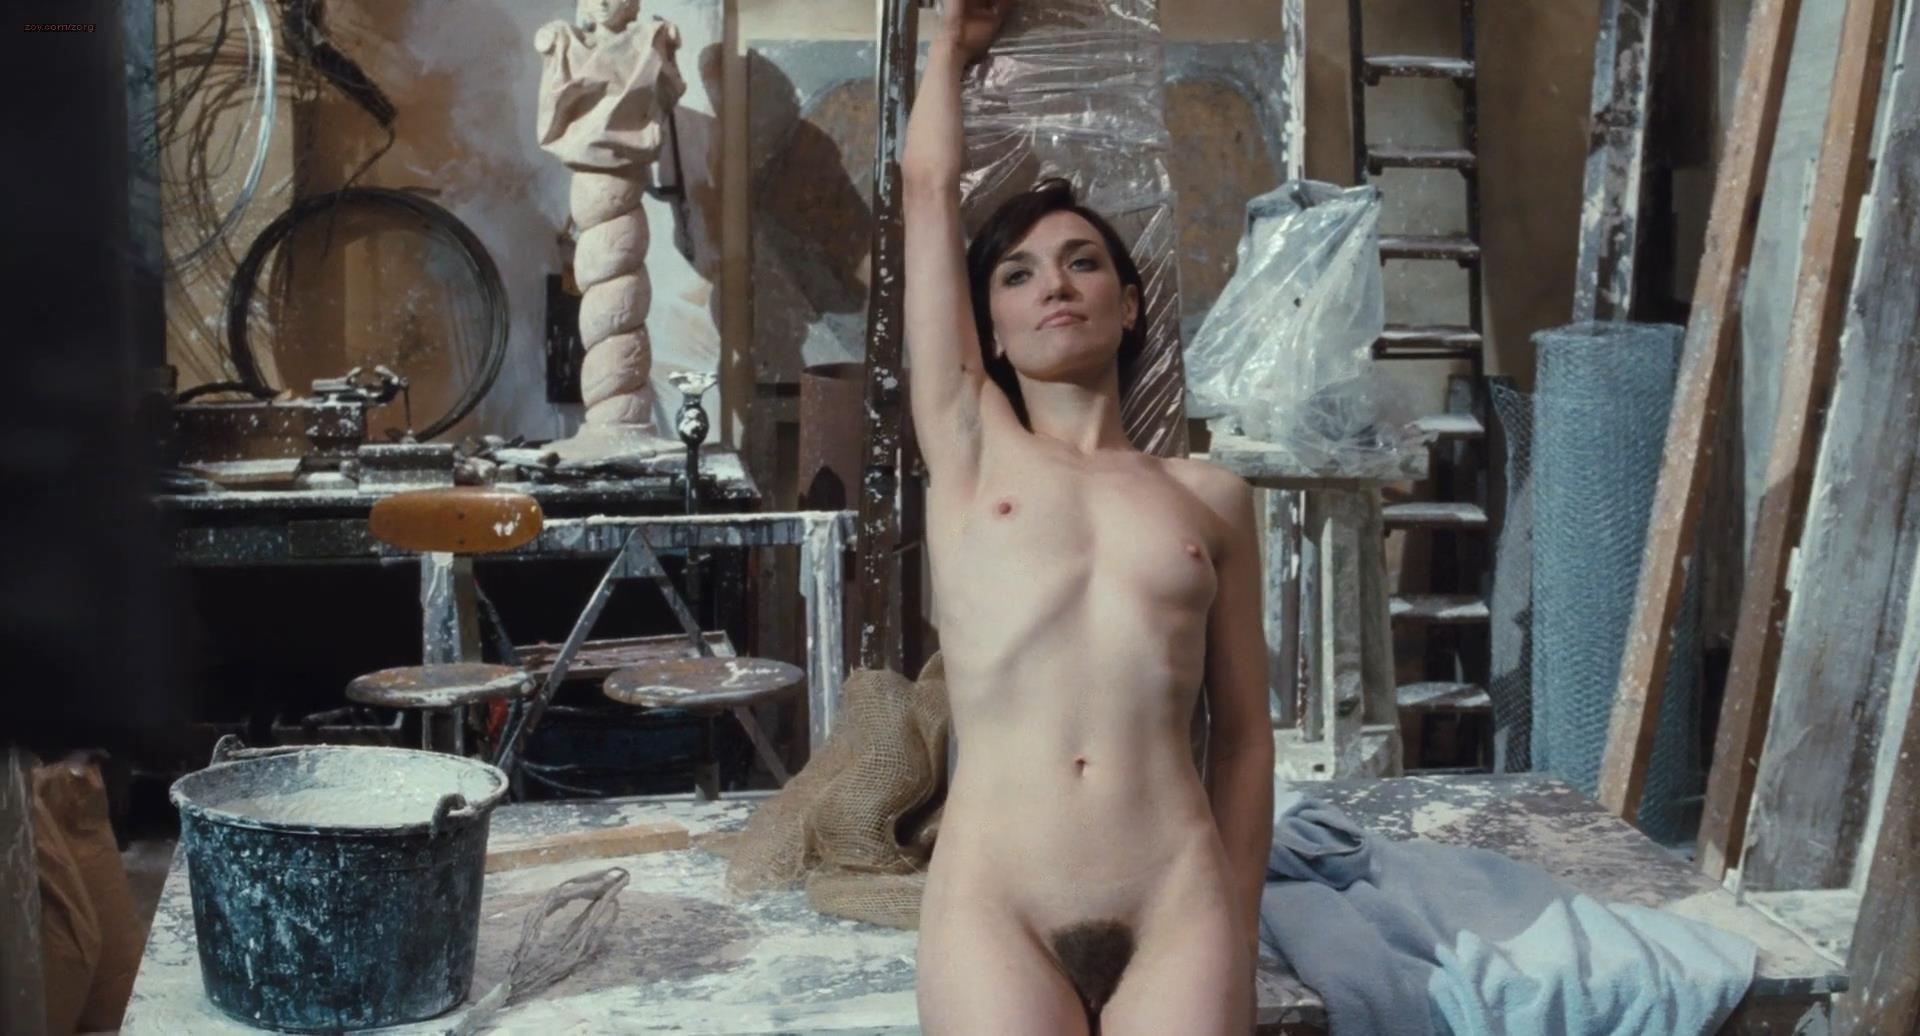 Angelique Pettyjohn Topless download sex pics angelique pettyjohn nude topless and sex